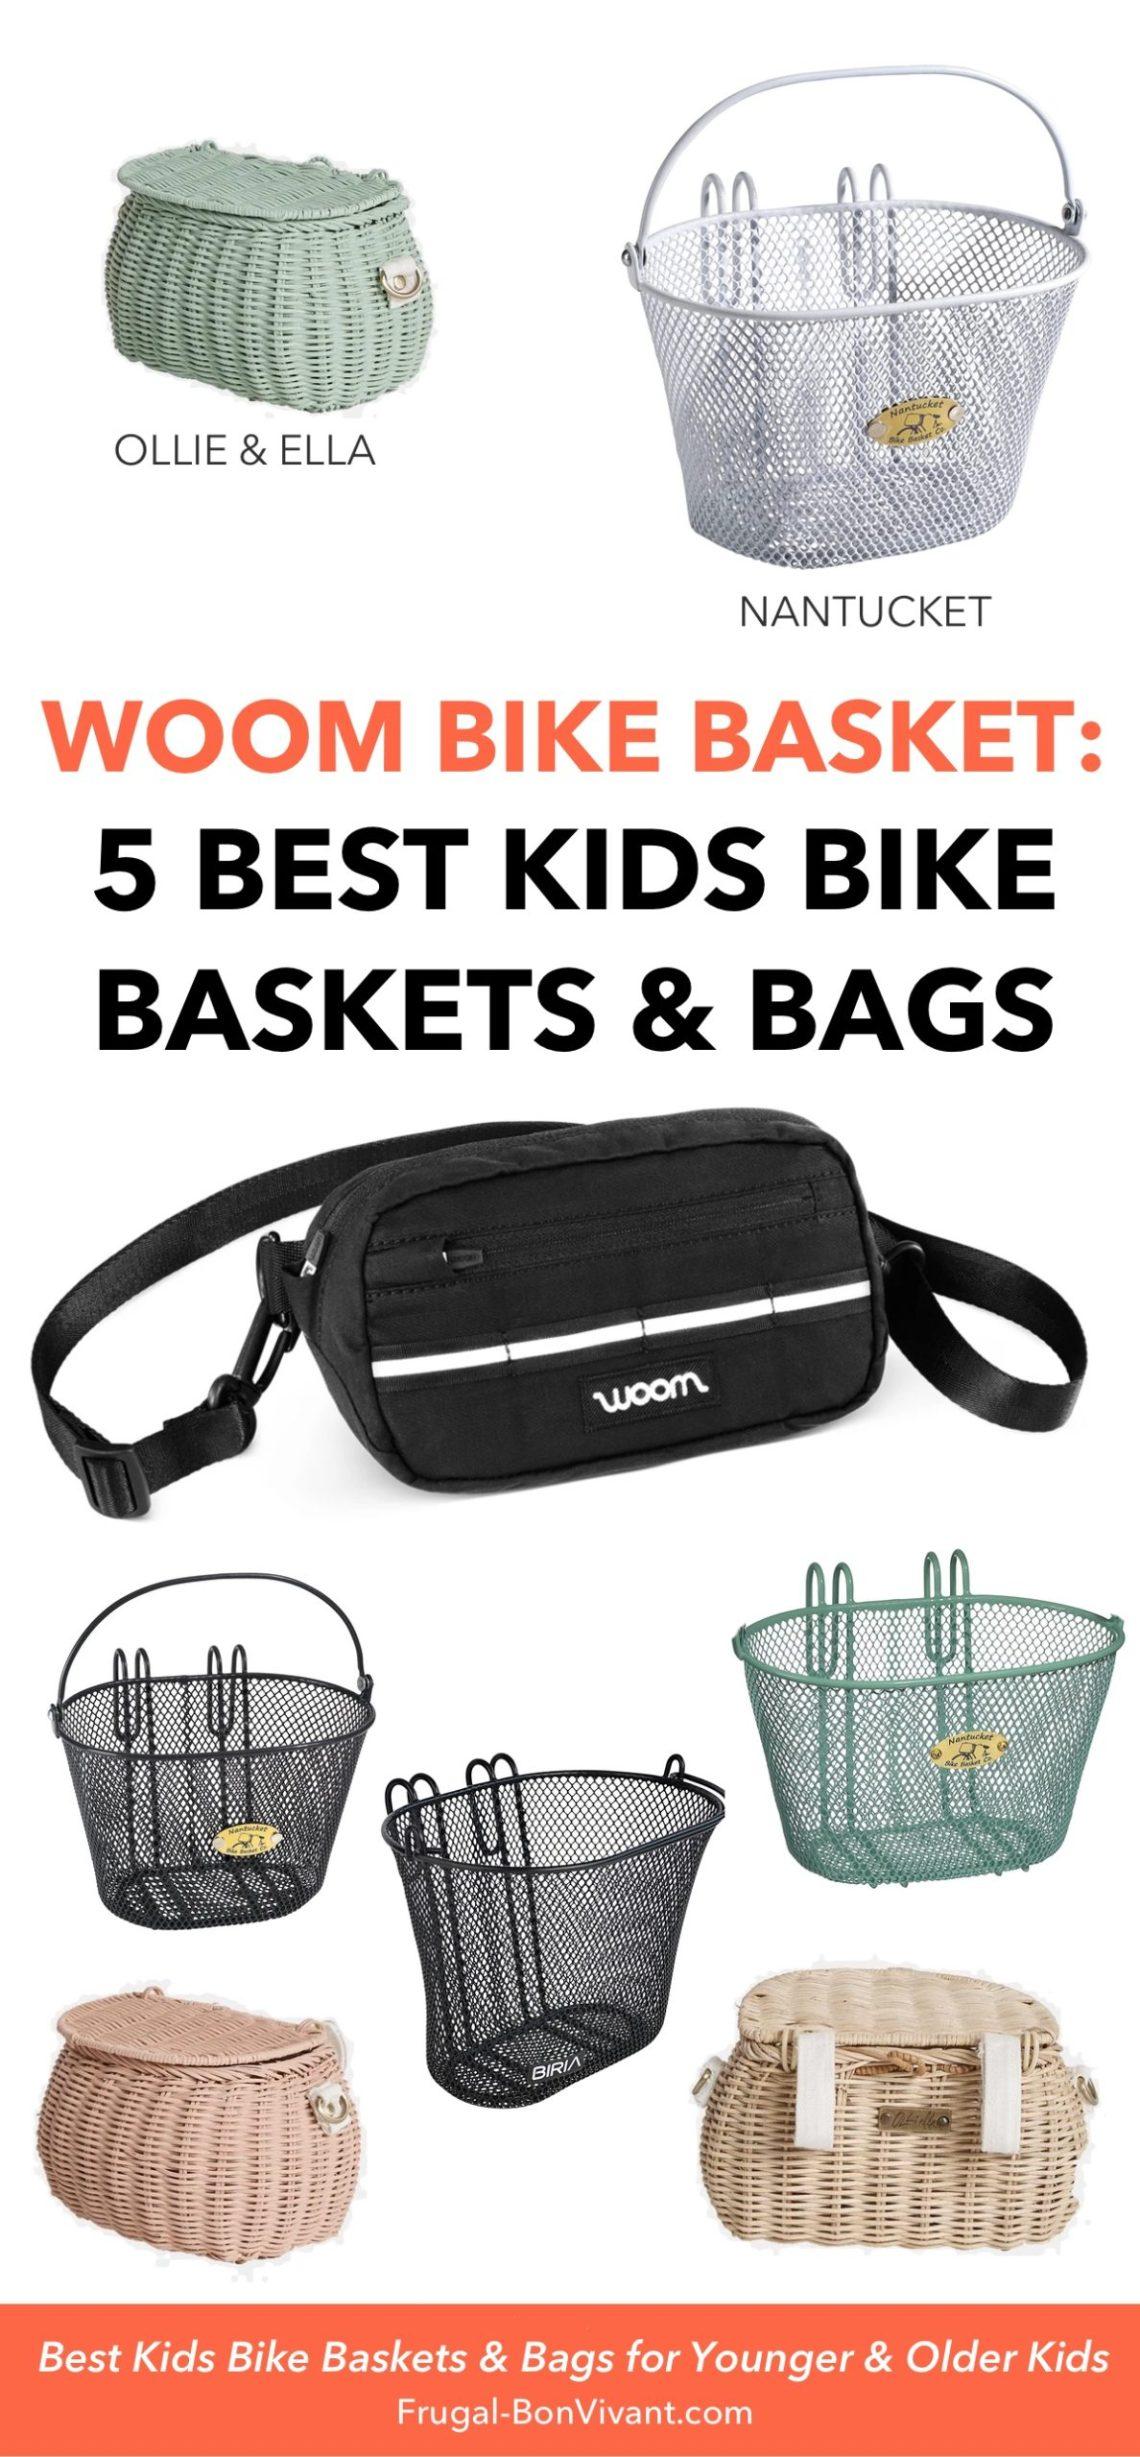 Best Kids Bike basket - Woom bike basket and bags